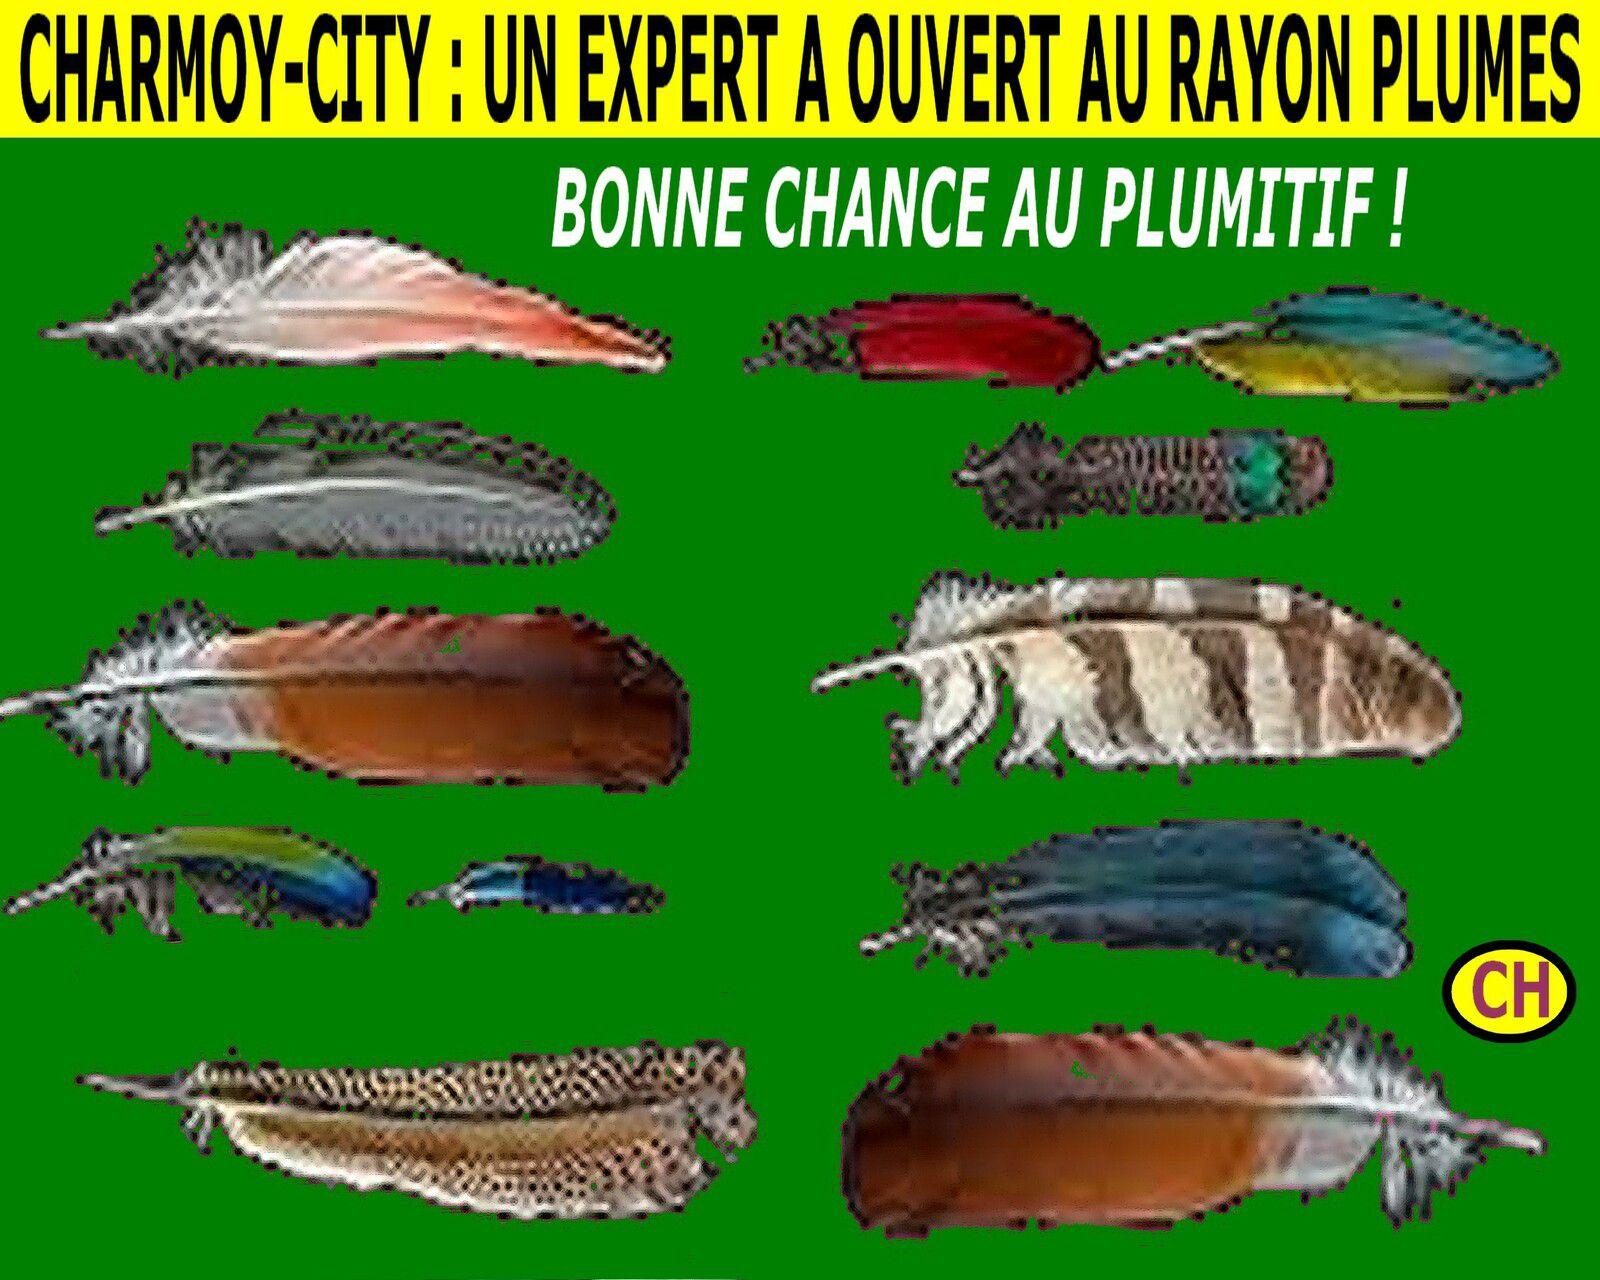 Charmoy-City expert en plumes.jpg